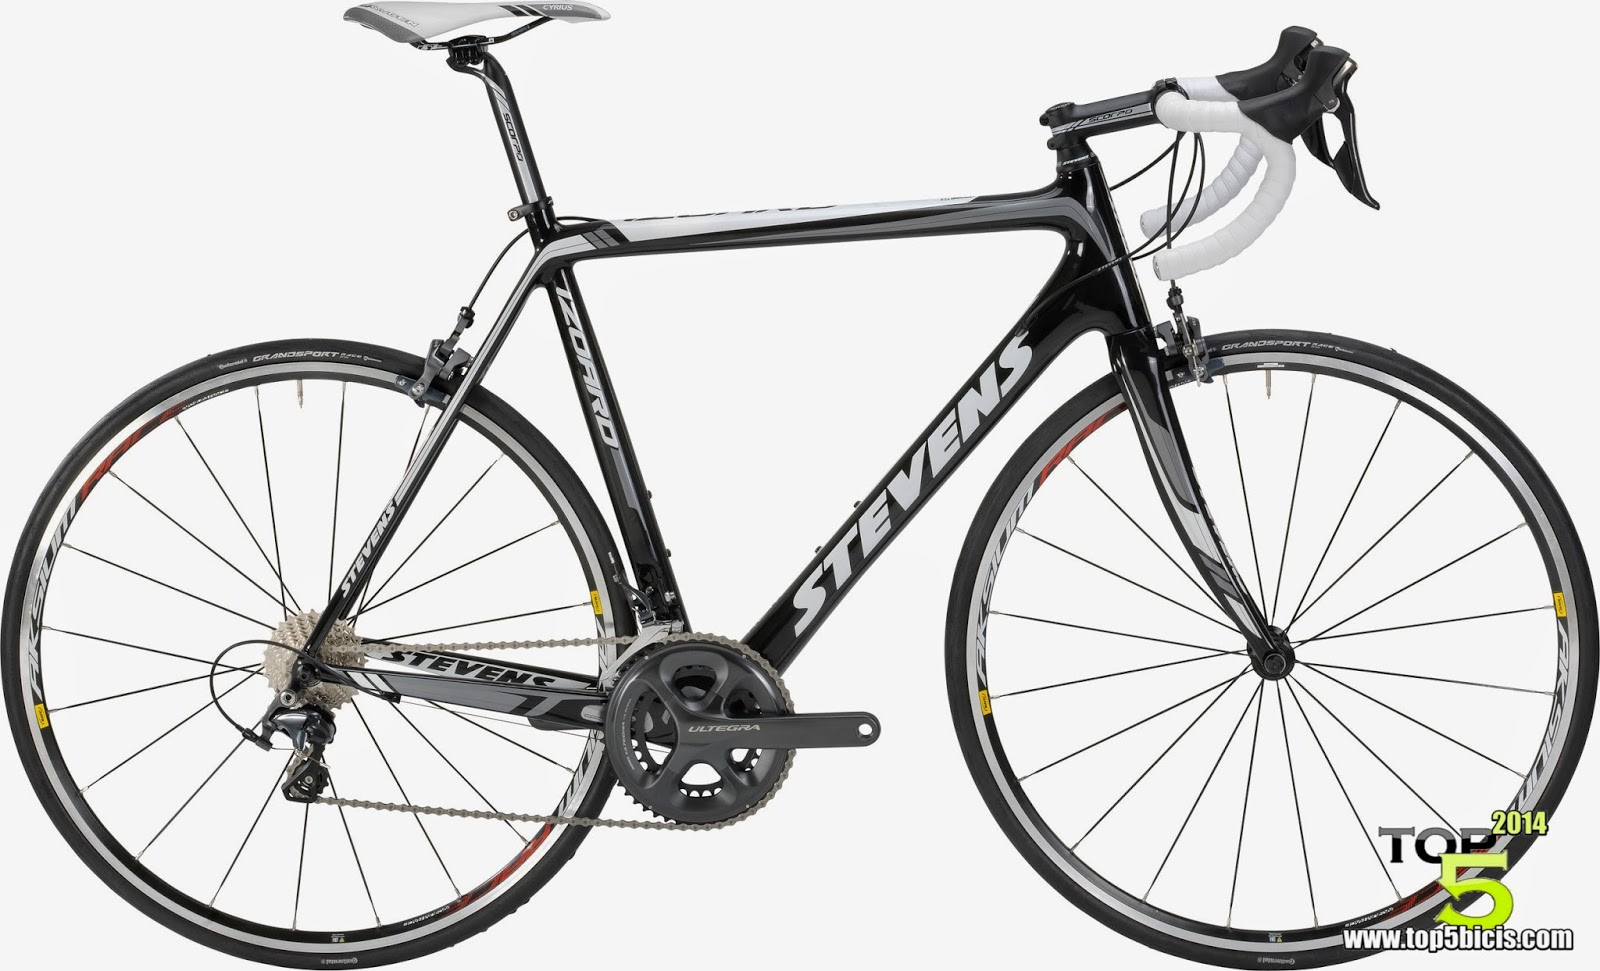 Top 5 bicicletas de carretera stevens izoard 2014 - La bici azul ...